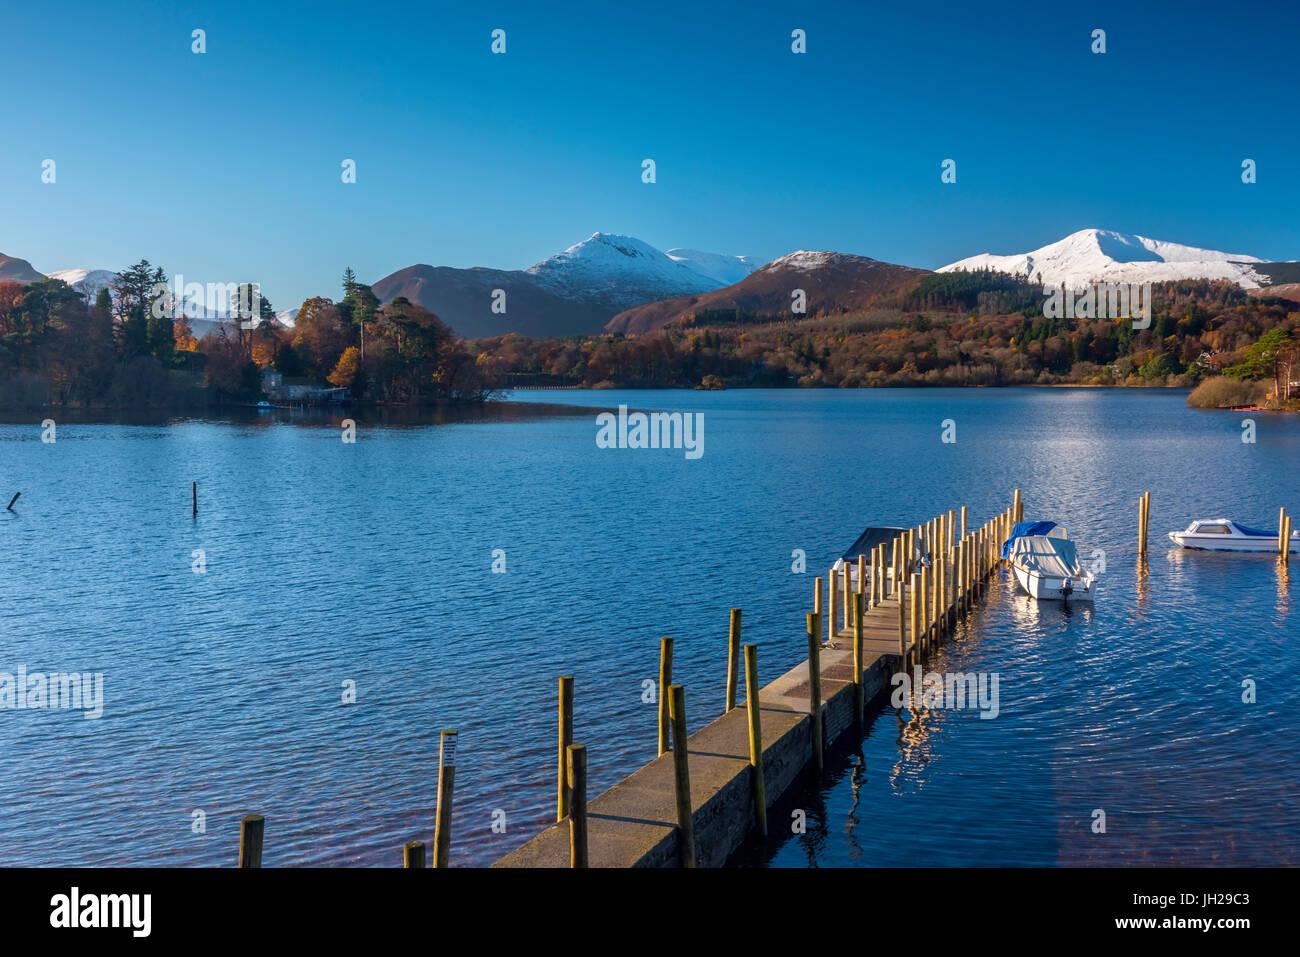 Derwentwater, Keswick, Lake District National Park, Cumbria, England, United Kingdom, Europe - Stock Image